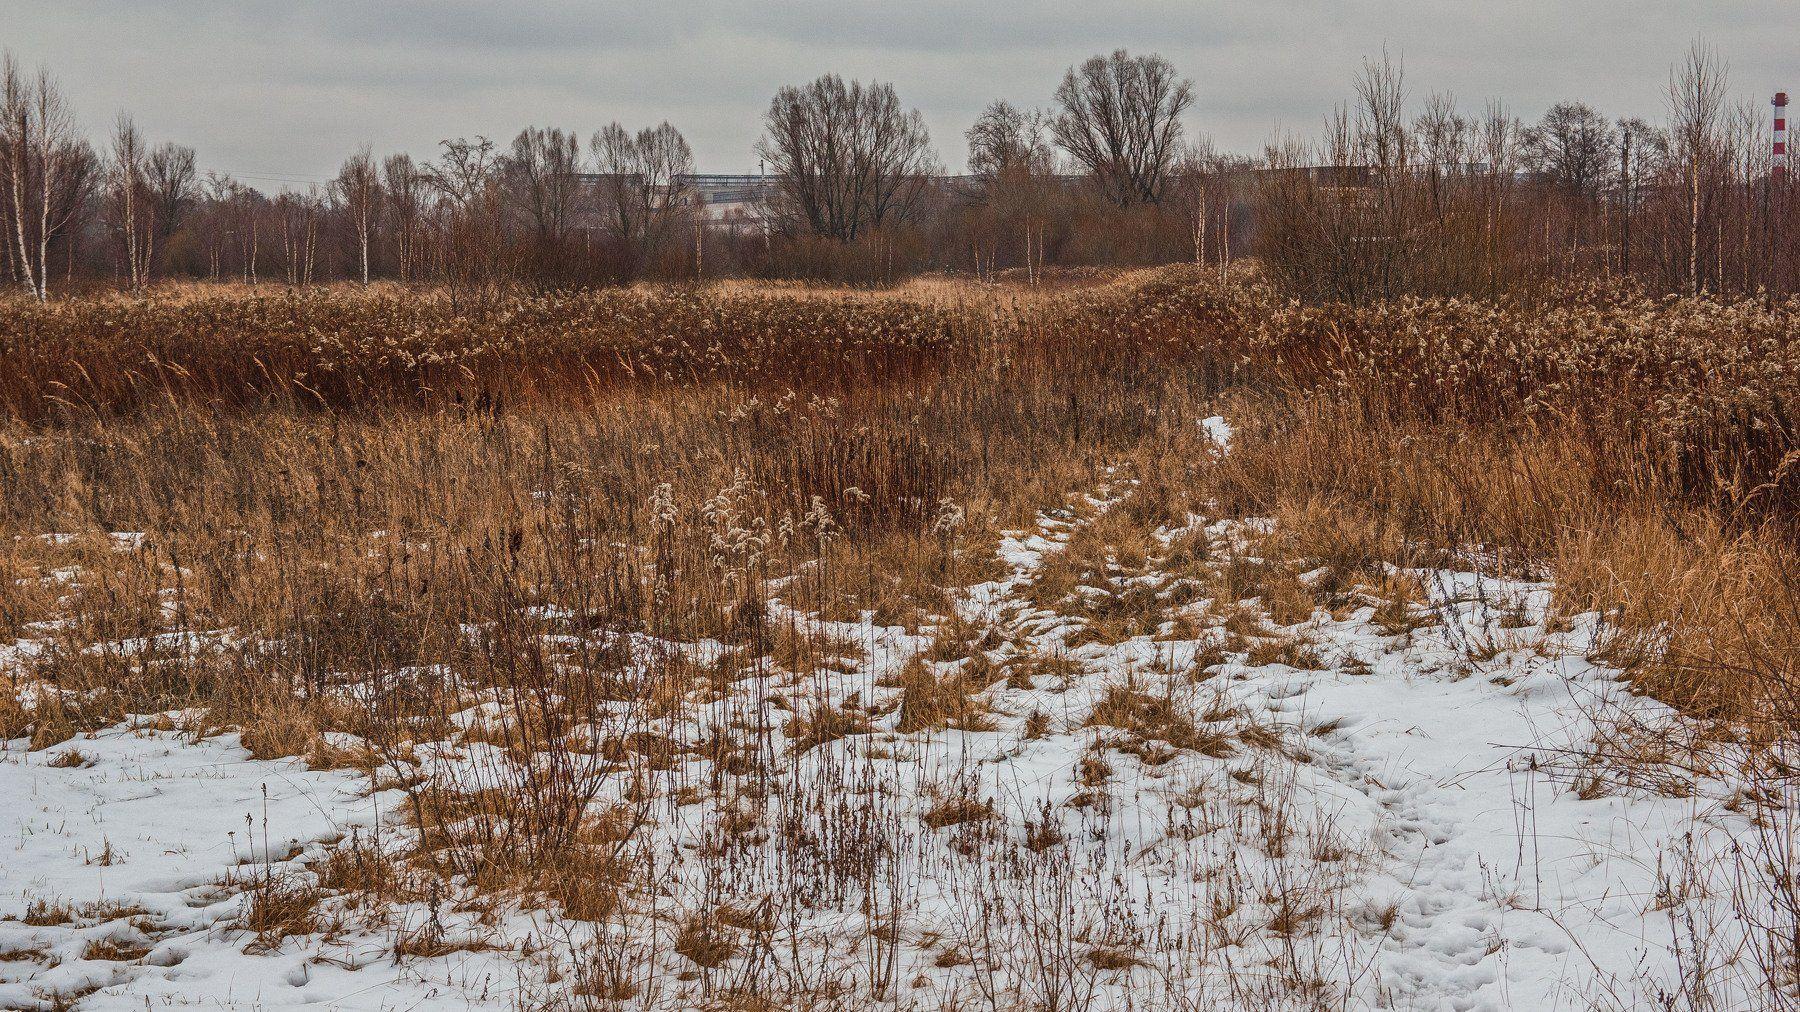 пейзаж, кулебаки, landscape, winter, зима, снег, snow, поле, трава, кустарник, field, grass, bush, Васильев Владимир